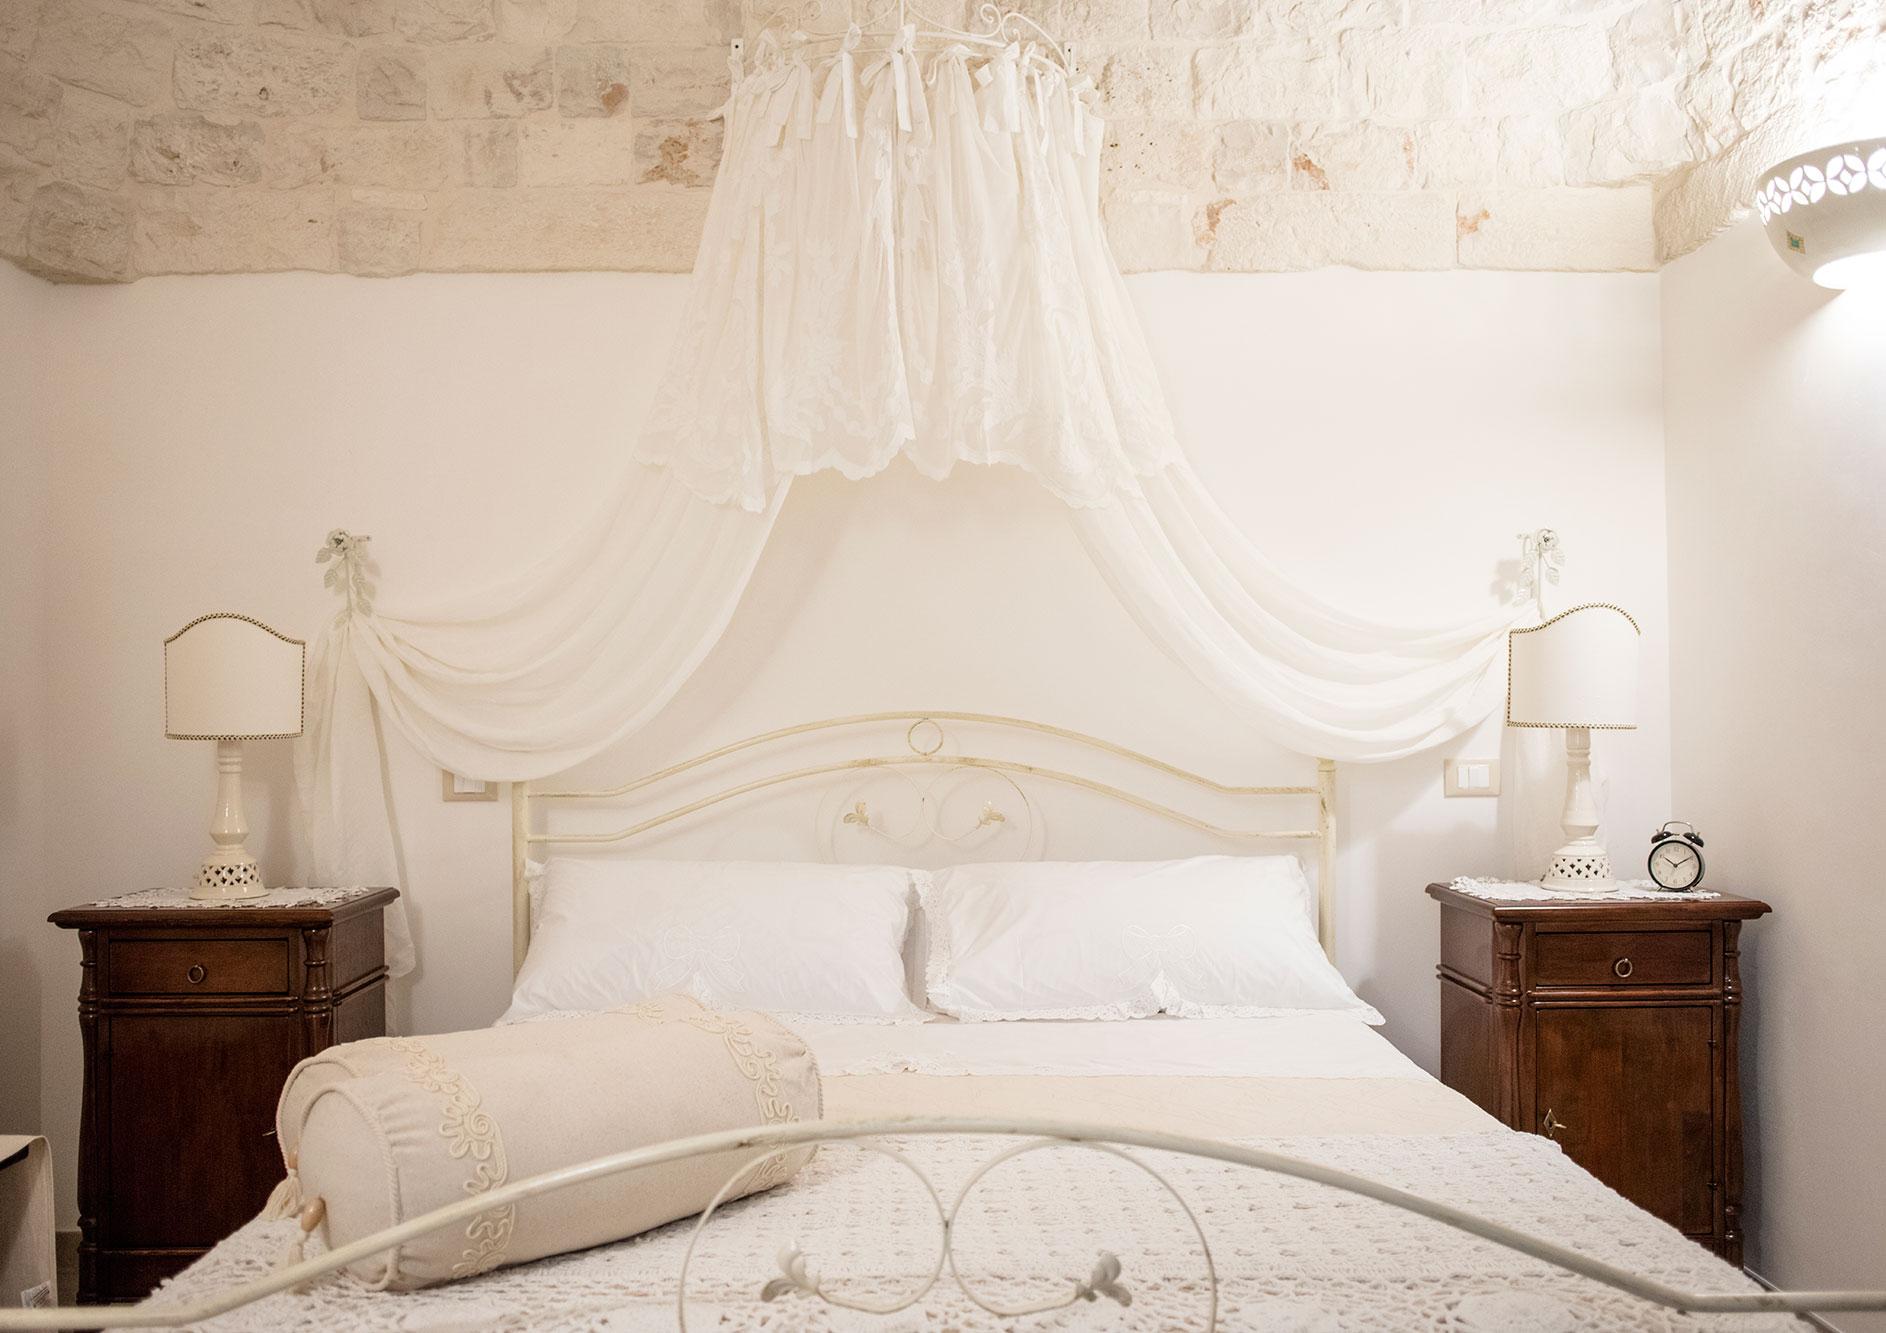 Dormire in Trullo Marina Franca Casa Vacanze